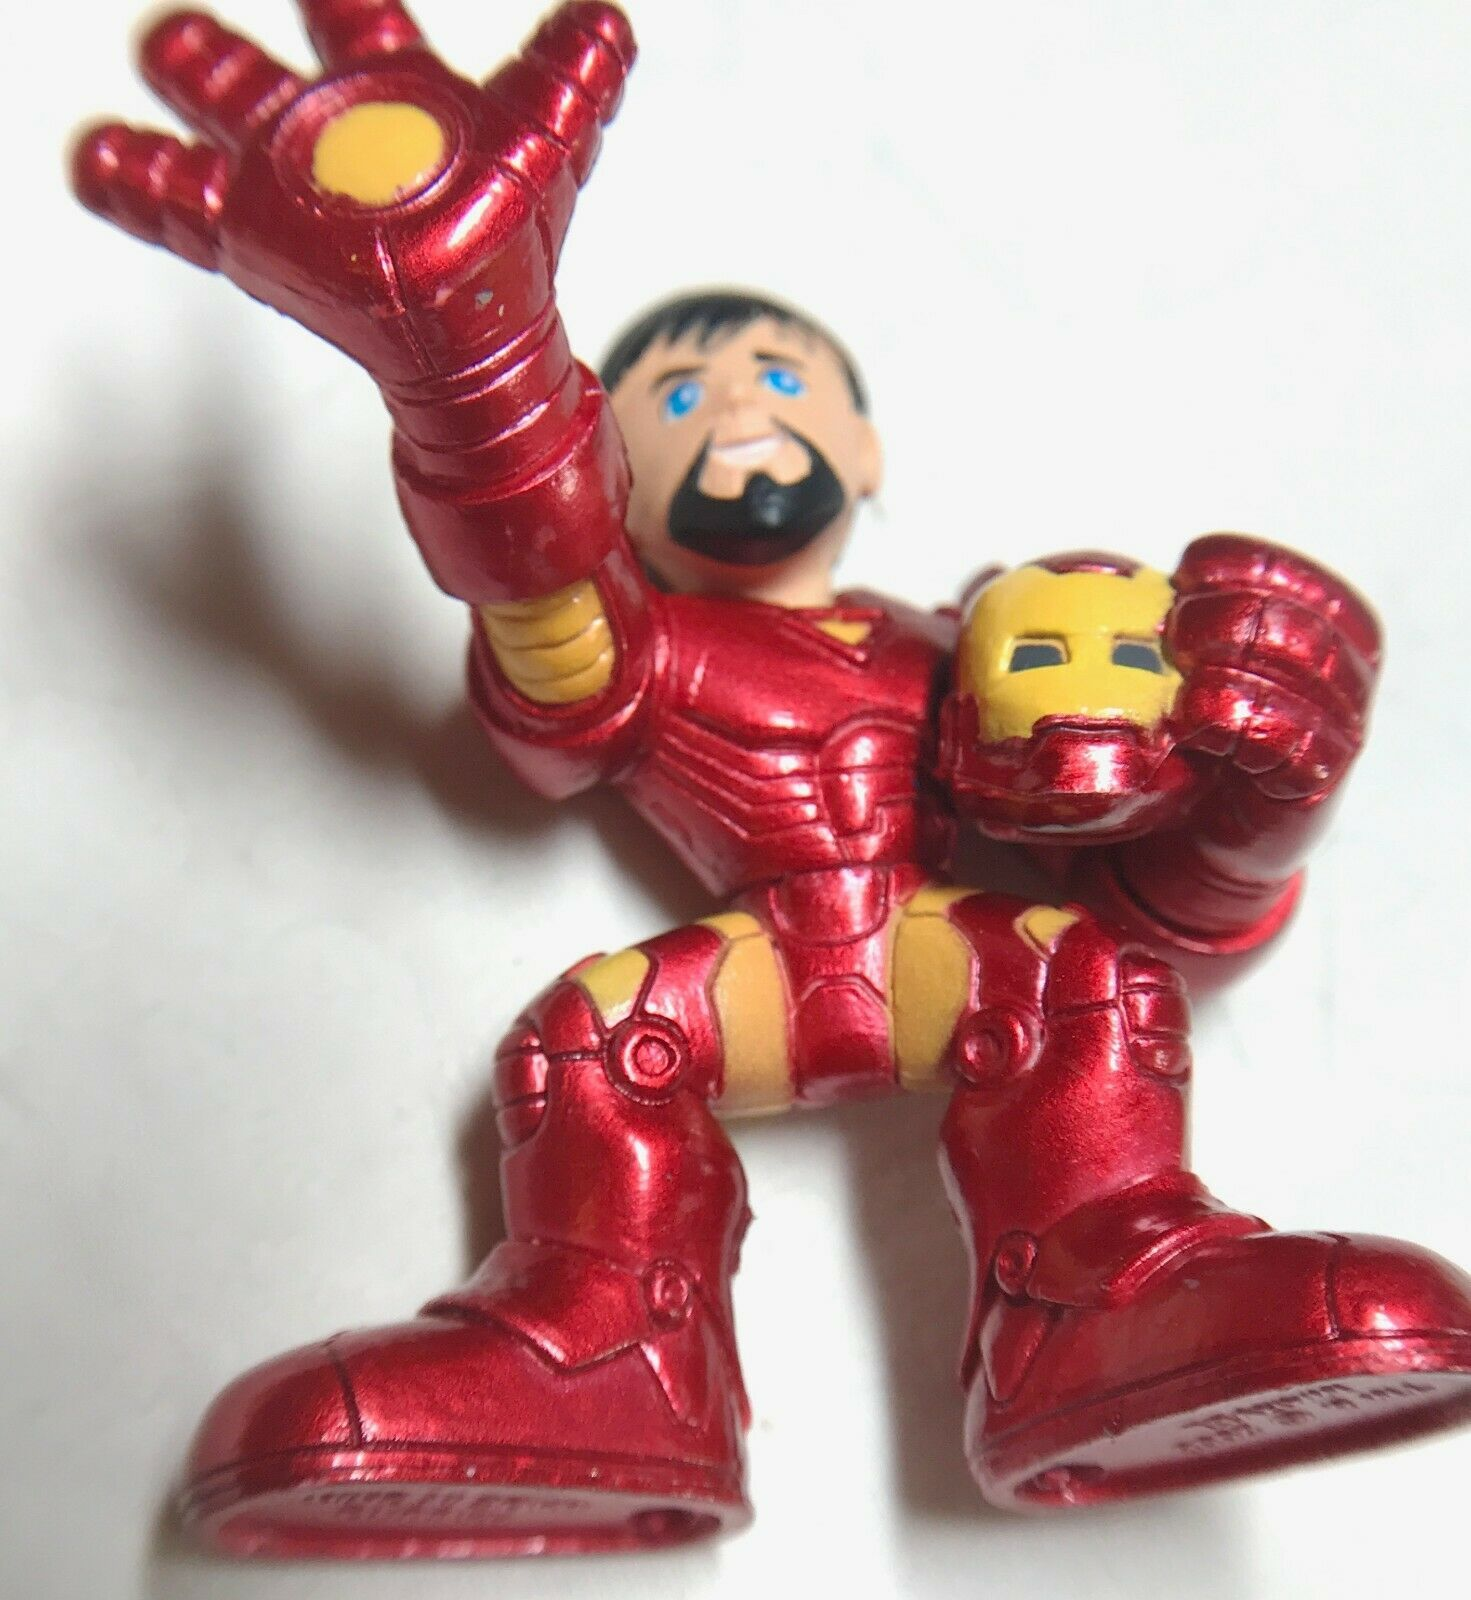 Marvel Super Hero Squad Iron Man Holding Helmet 2008 image 2